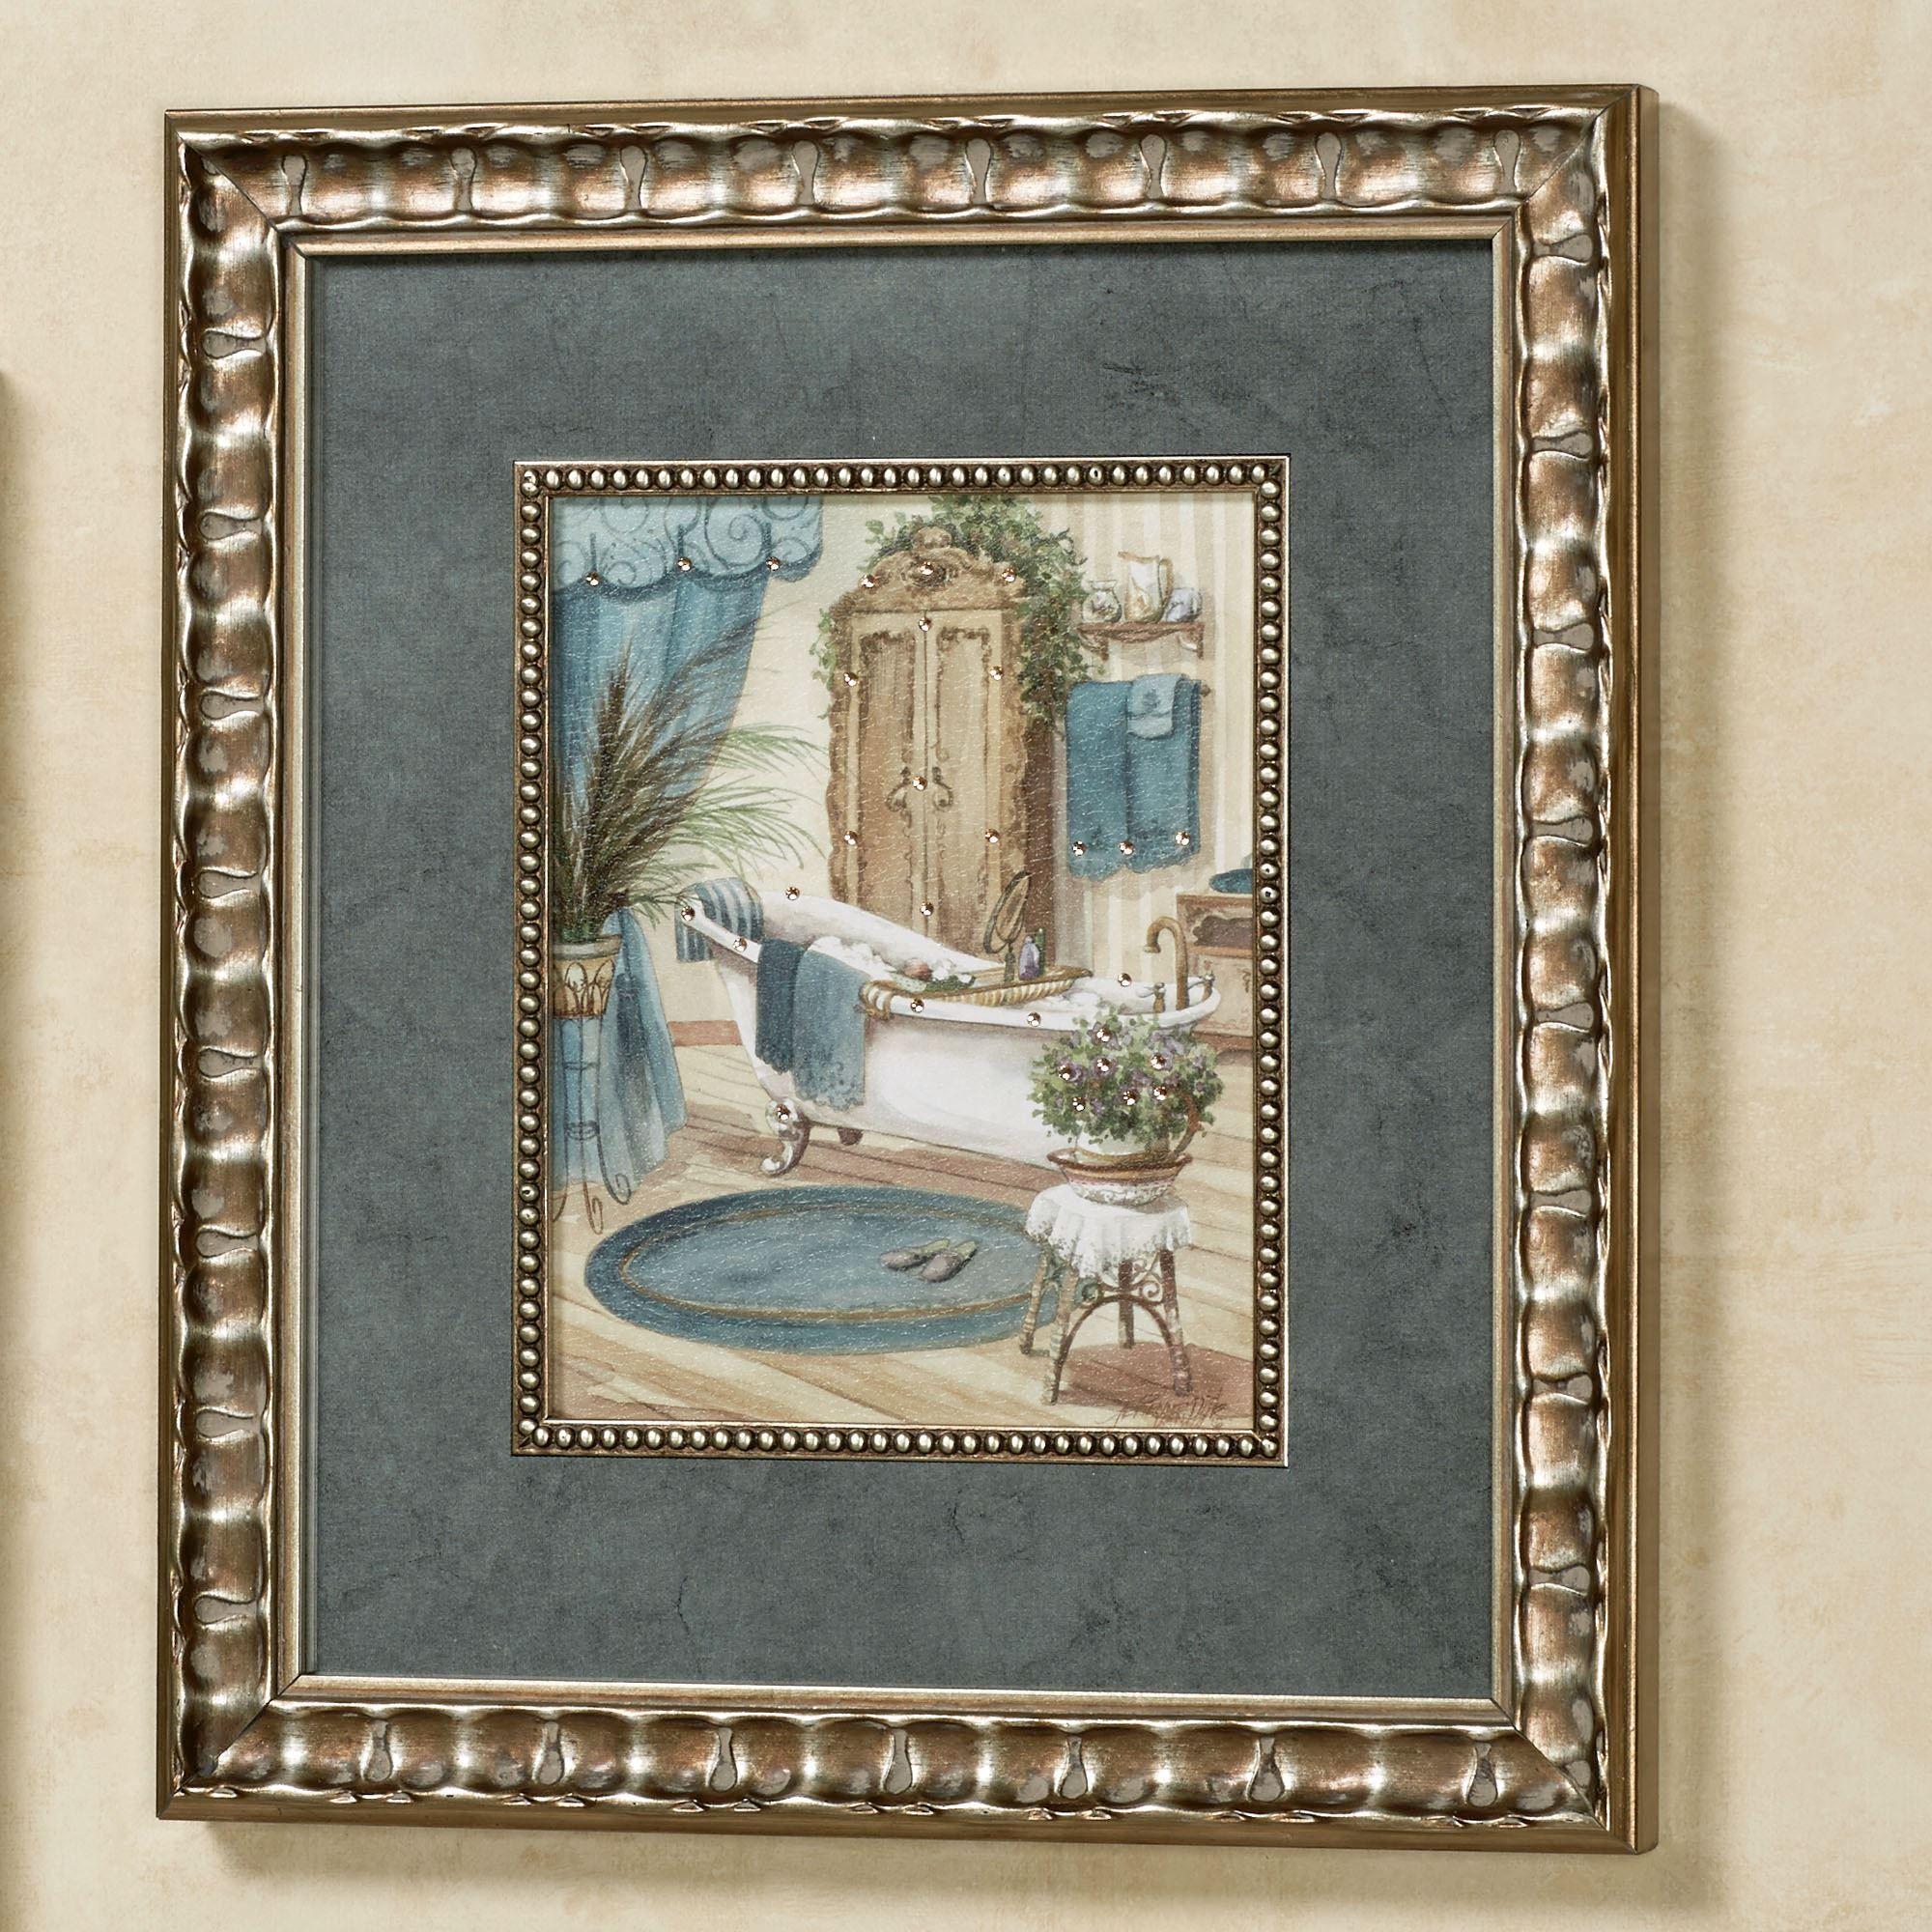 Victorian Bath II Framed Wall Art Multi Cool  sc 1 st  Touch of Class & Victorian Bath Framed Wall Art